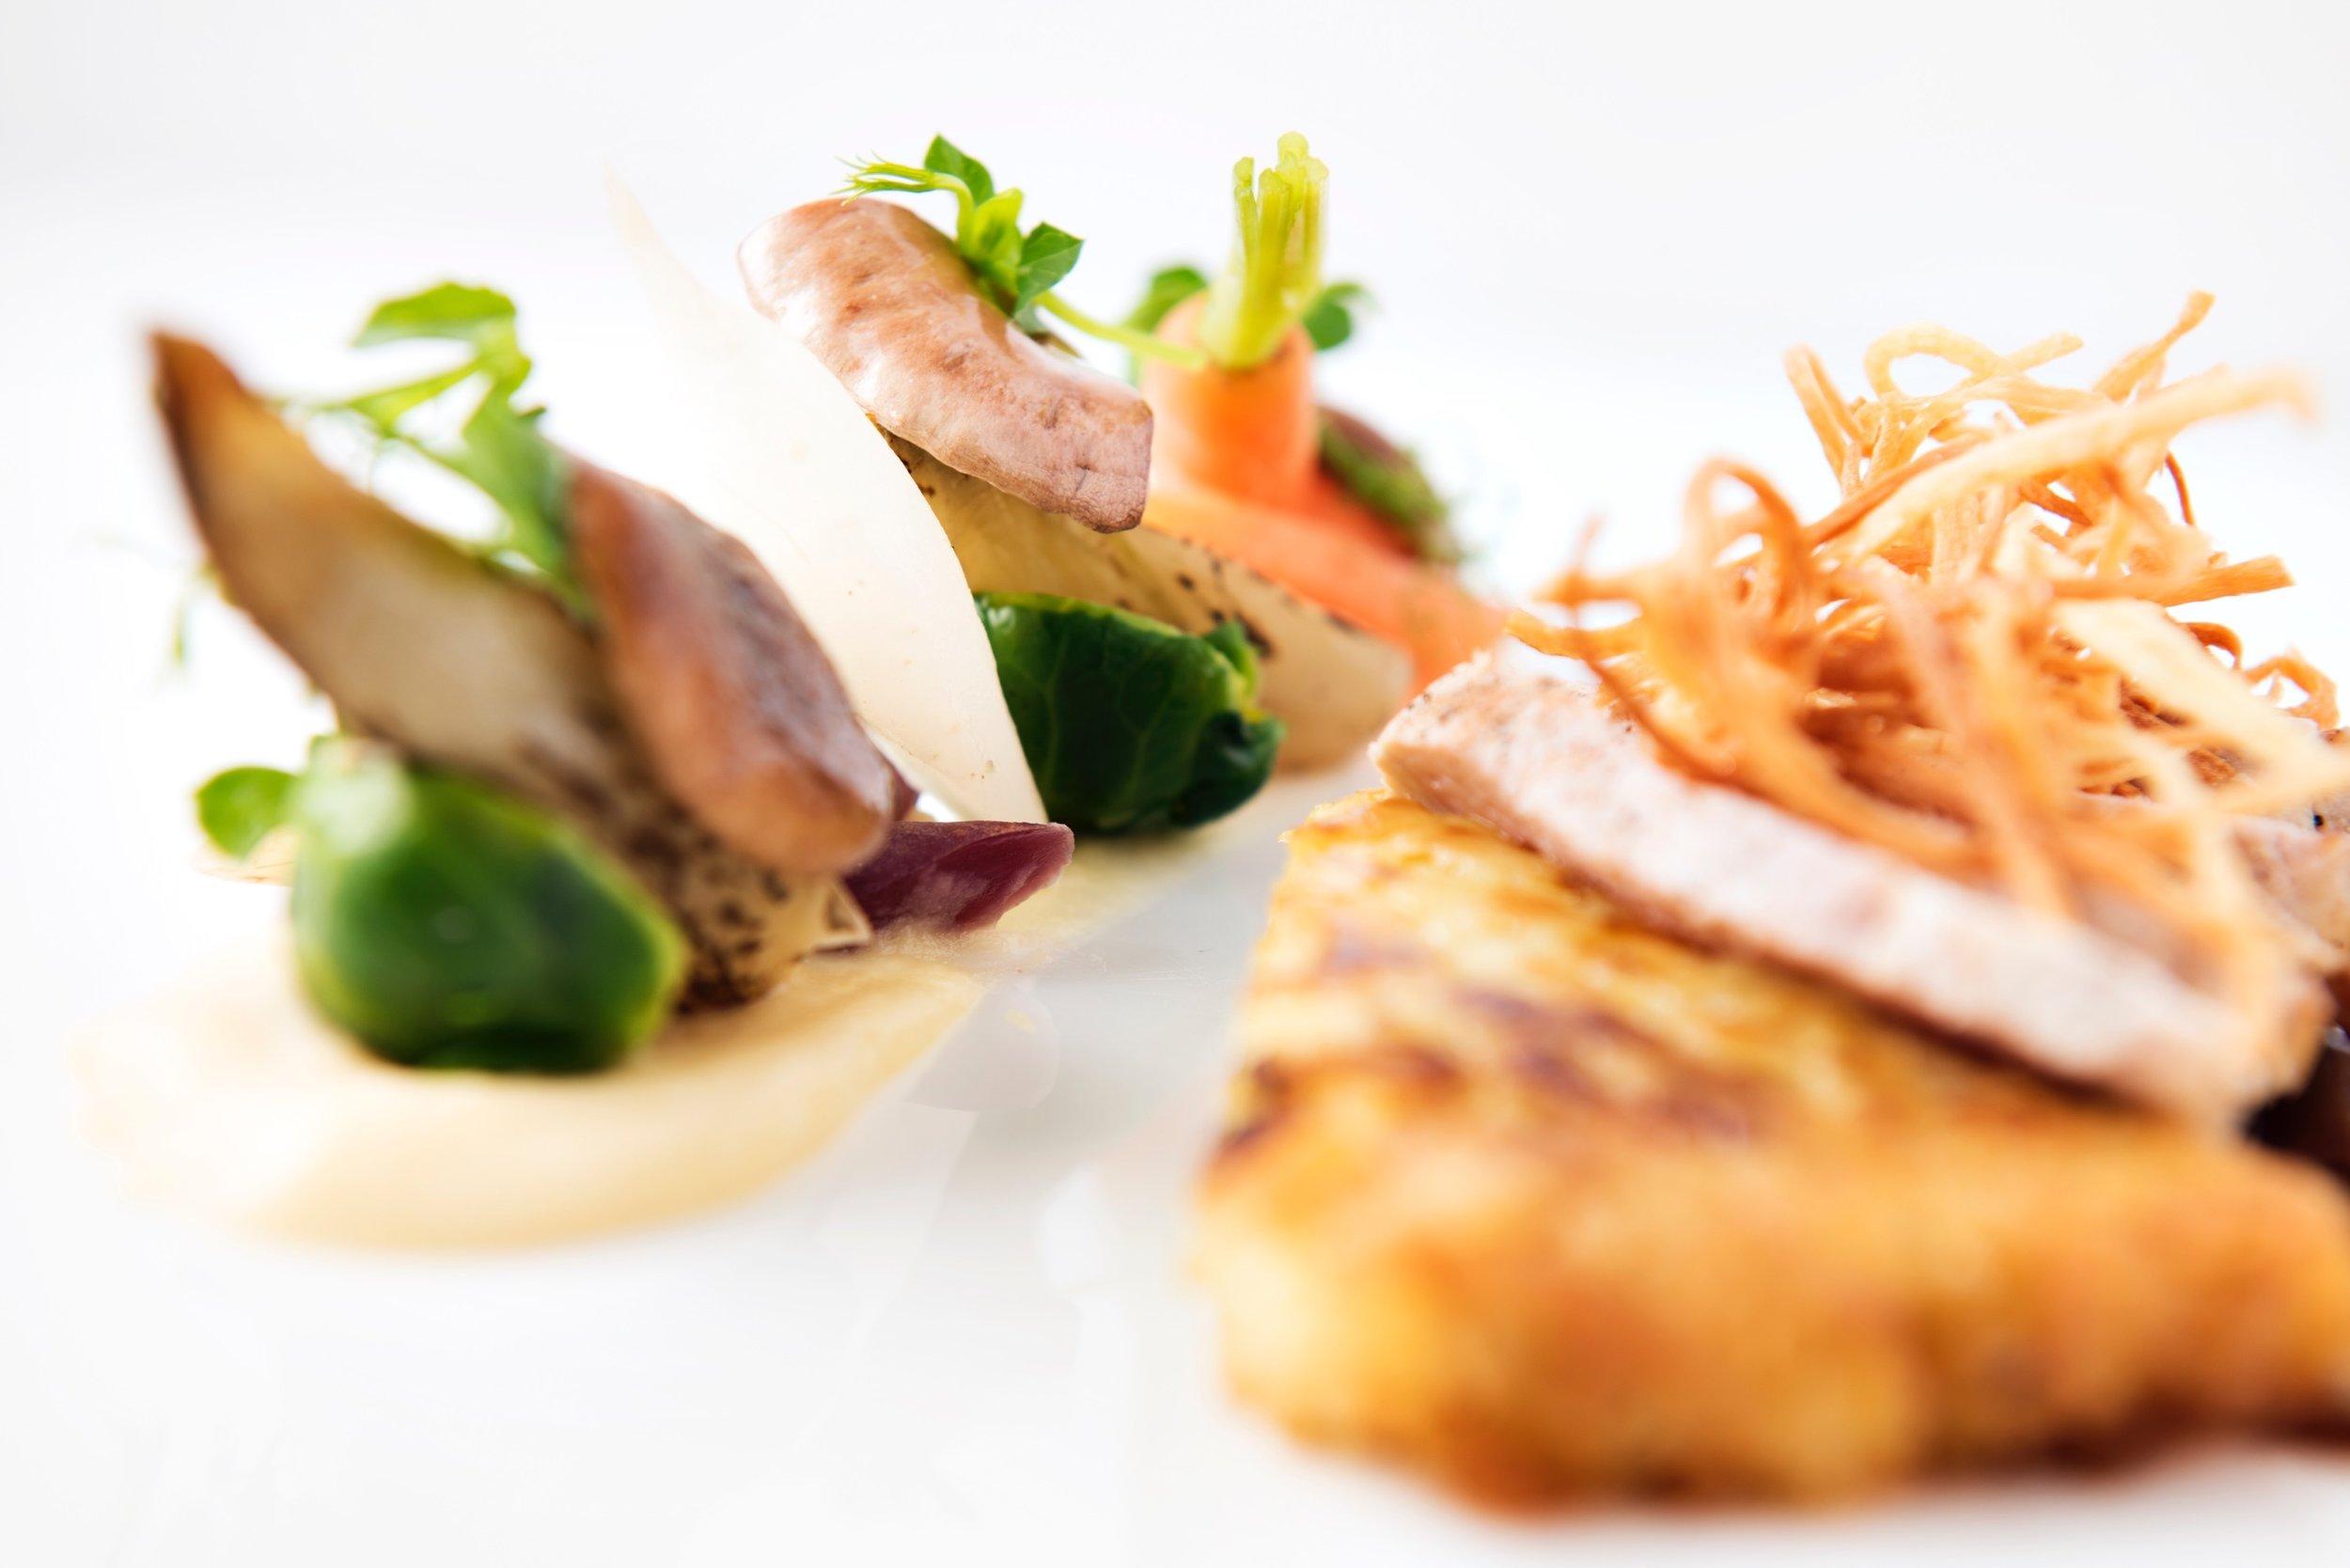 16 michelin restaurant the glorious antwerpen tablefever bart albrecht.jpg